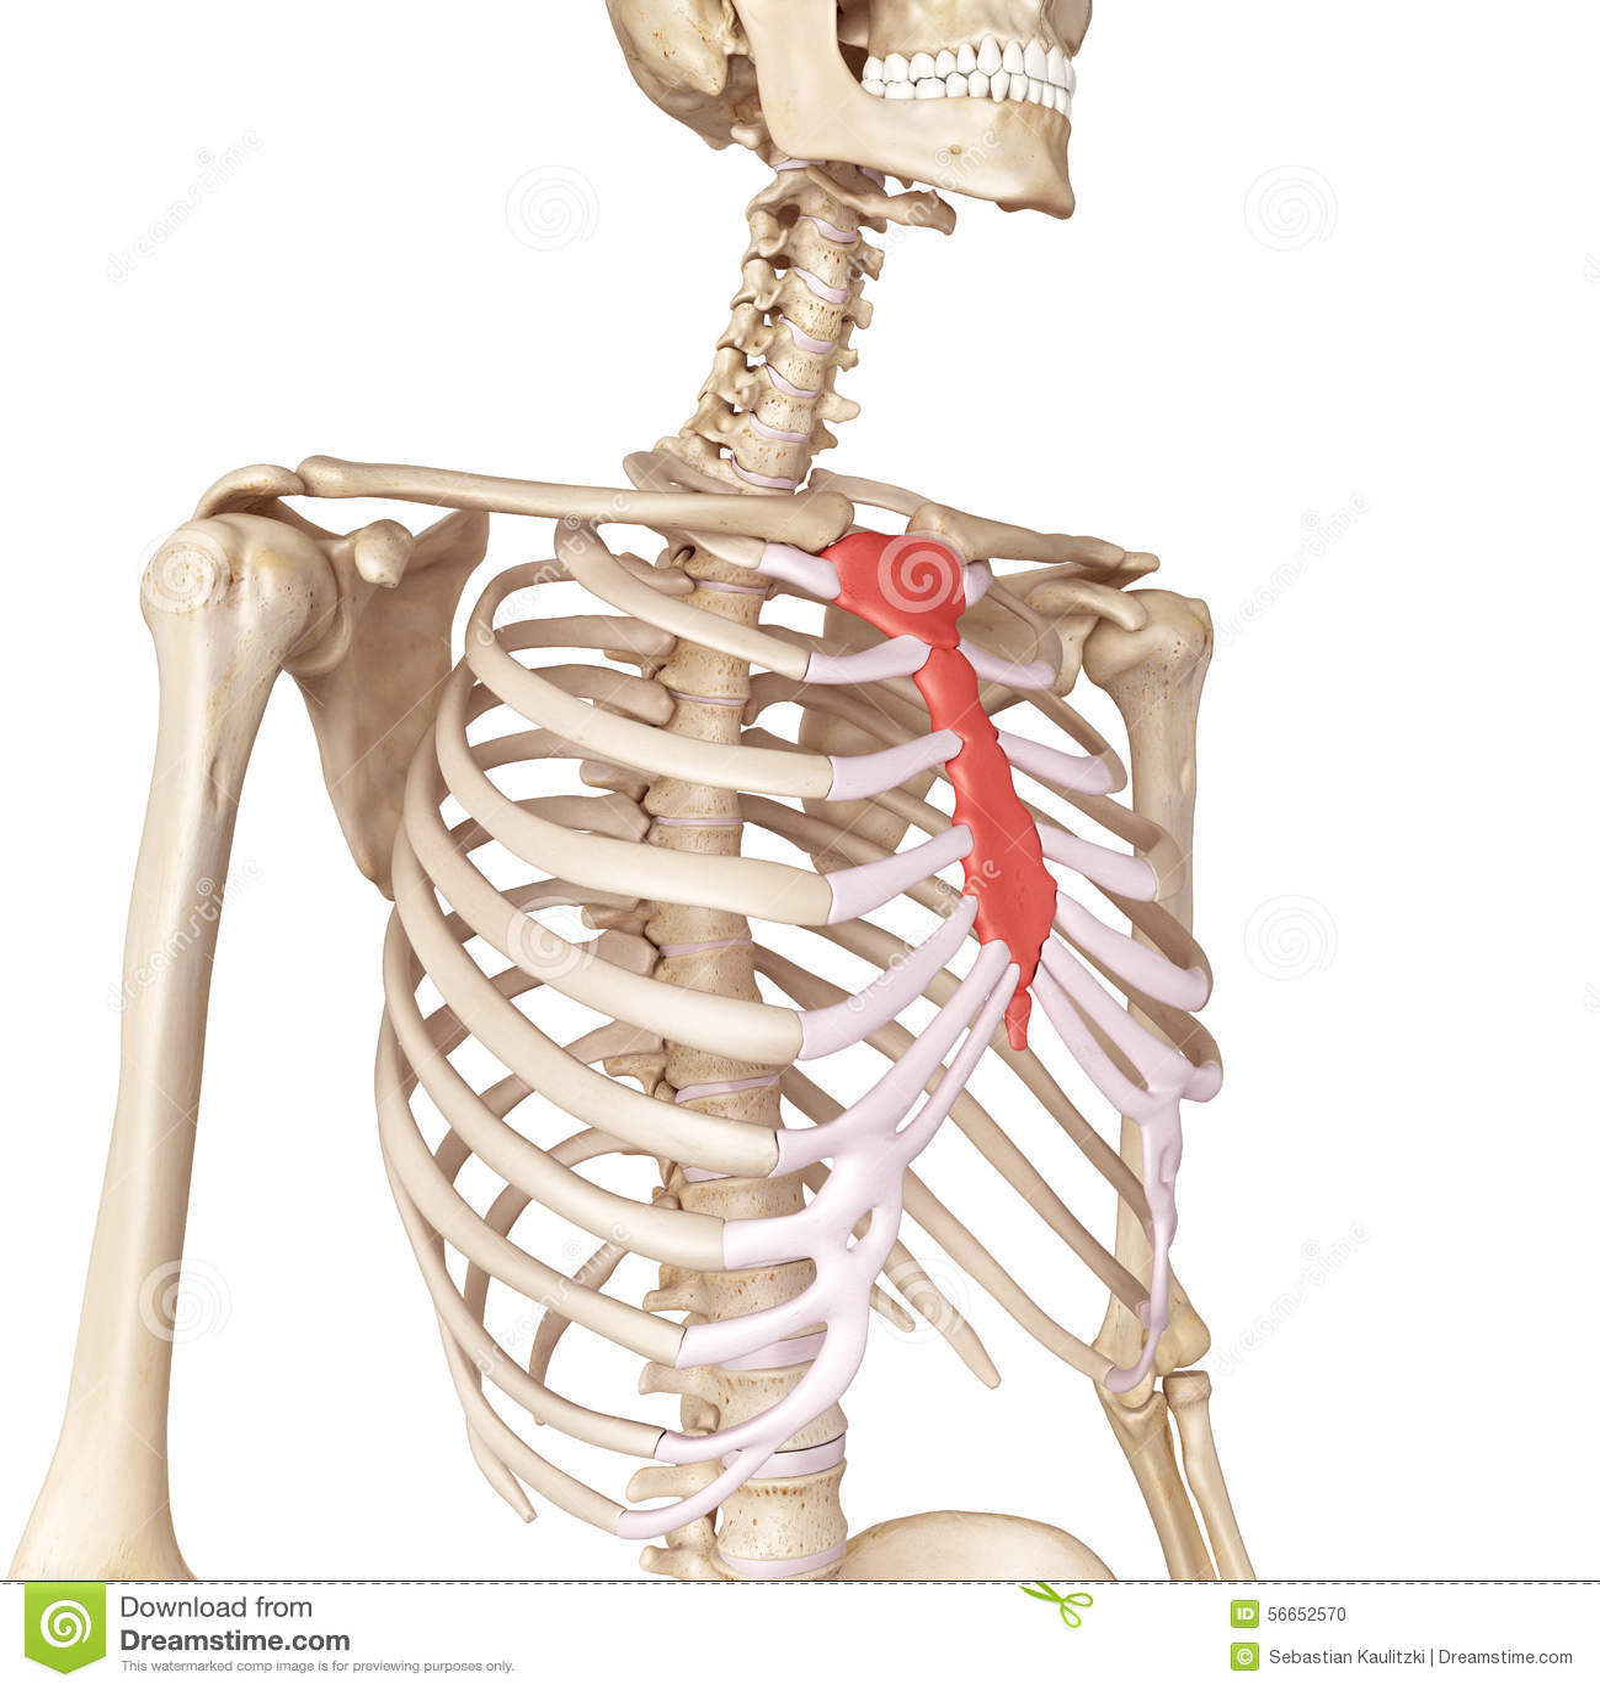 Sternum Bones Images Free Download Sternum Bone Anatomy